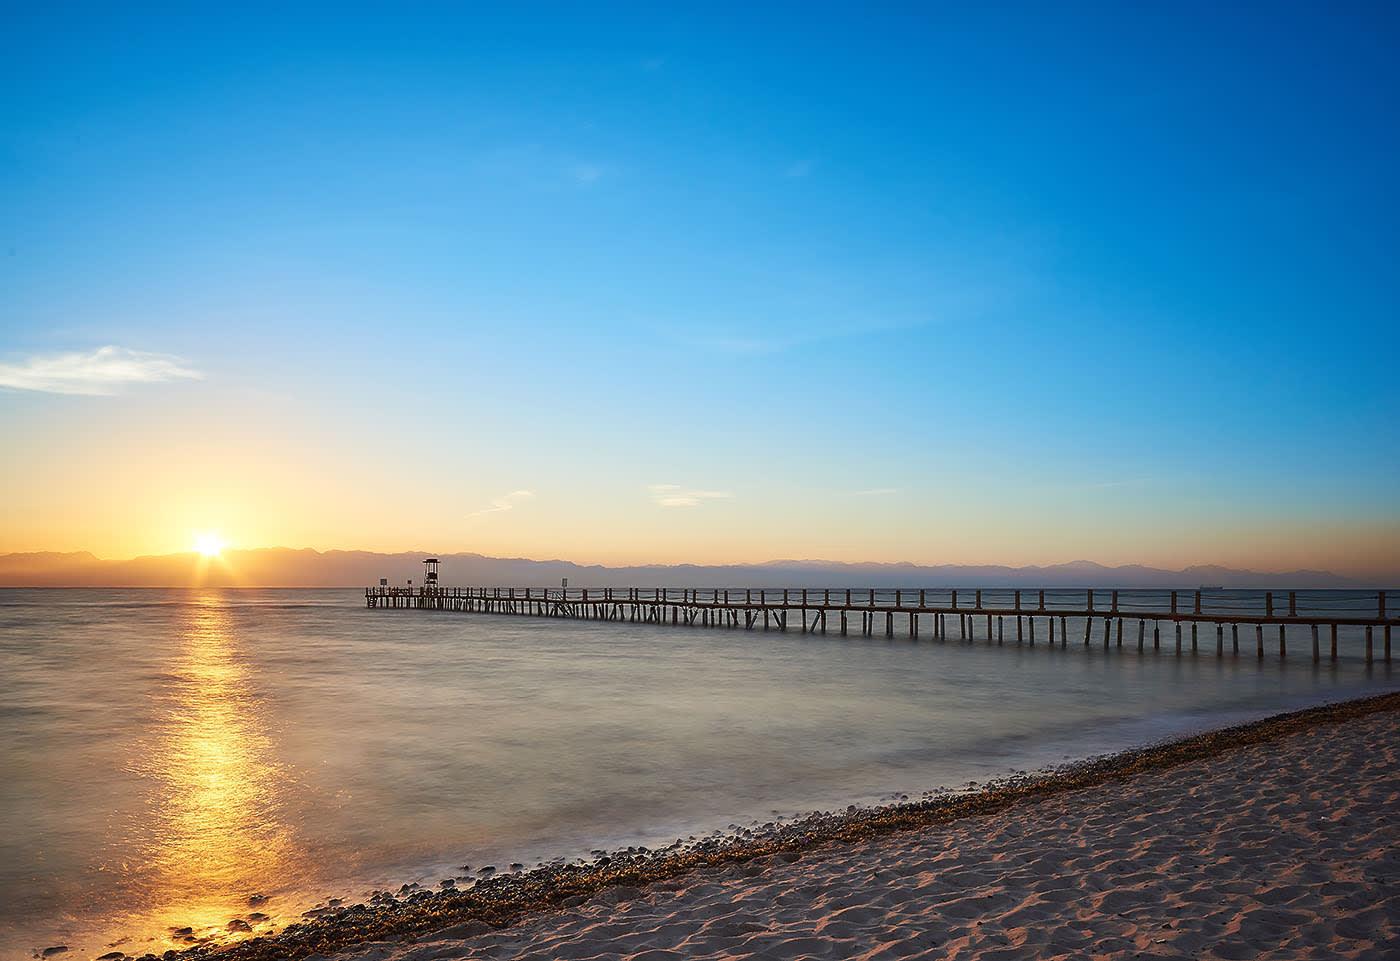 Sofitel Taba heights beach resort jetty at morning - Mohamed Abdel-Hady photography